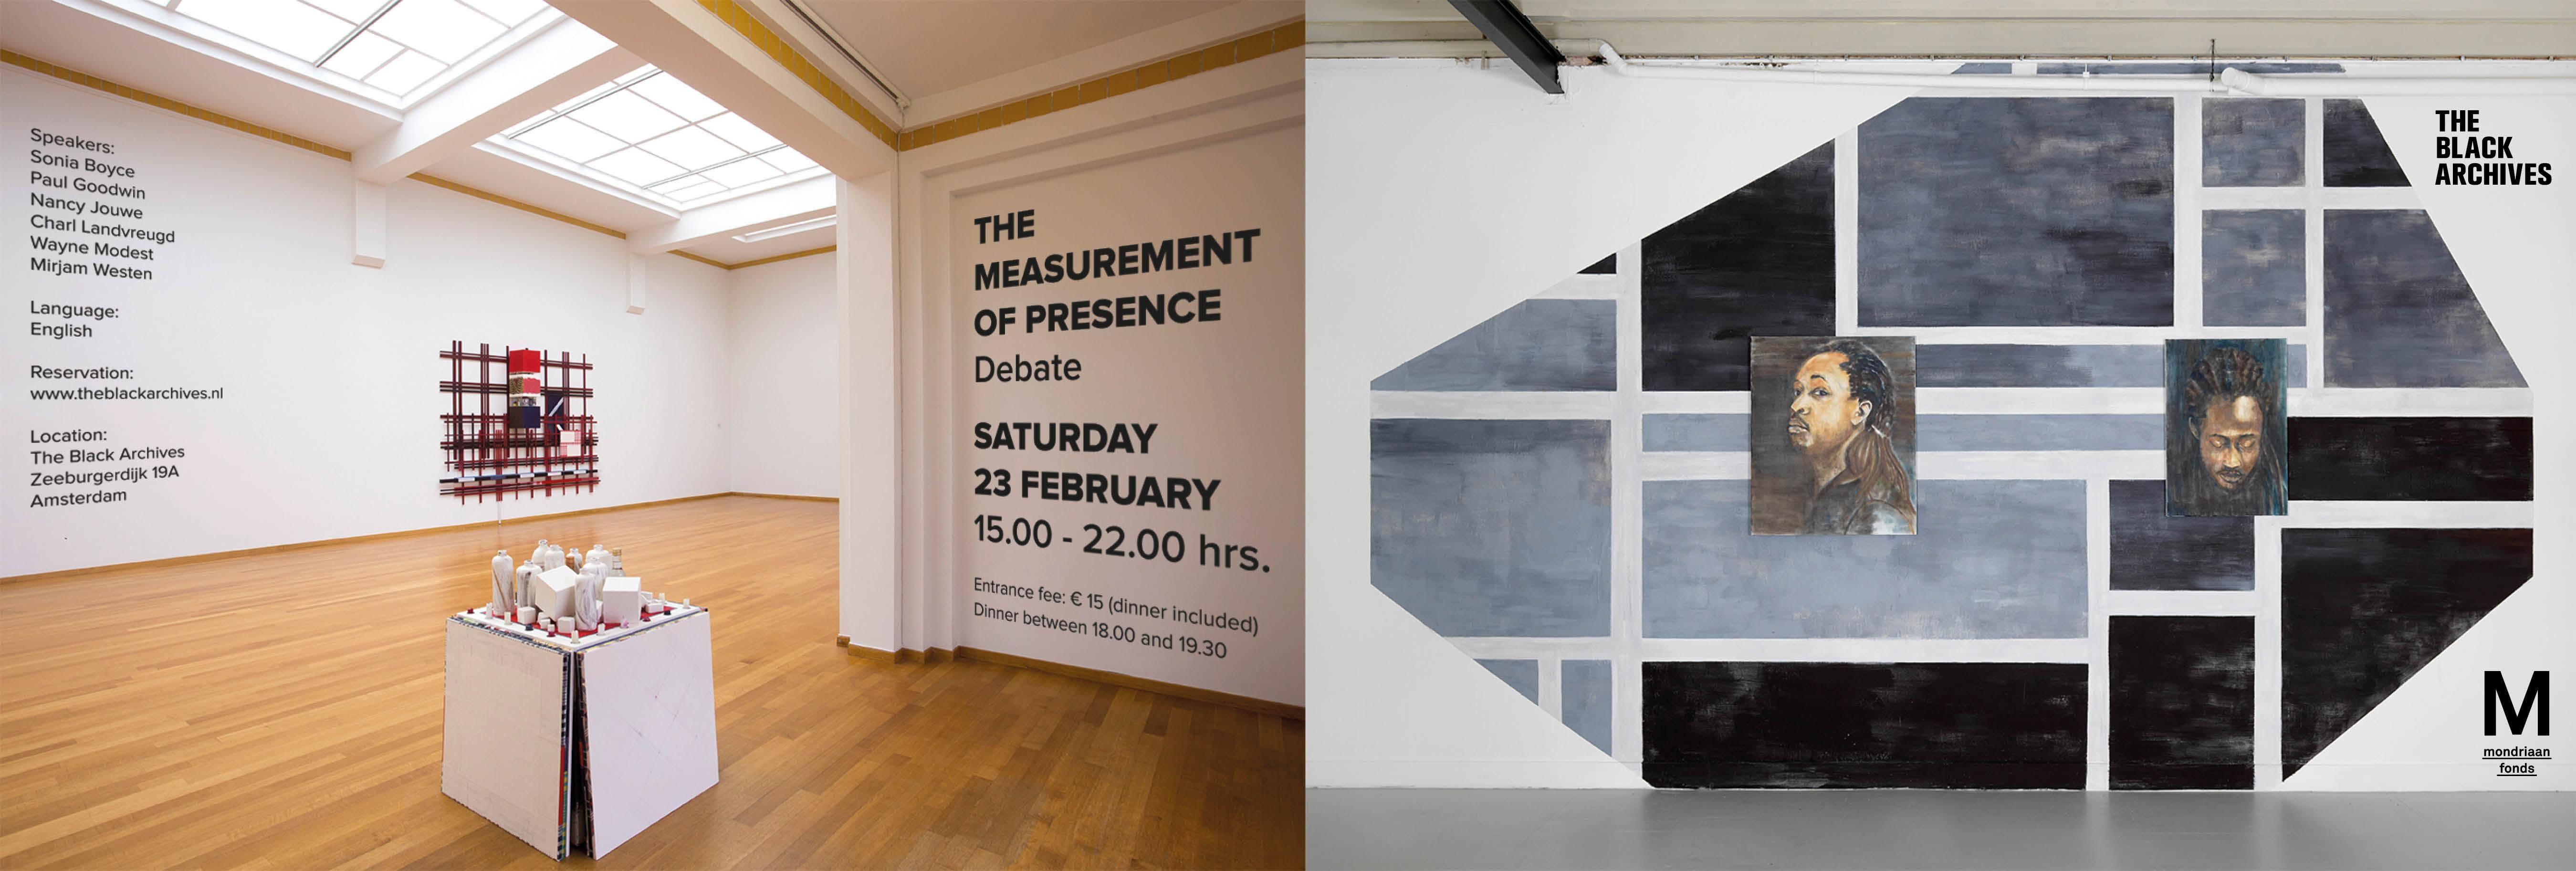 The Measurement of Presence: debate in the ru